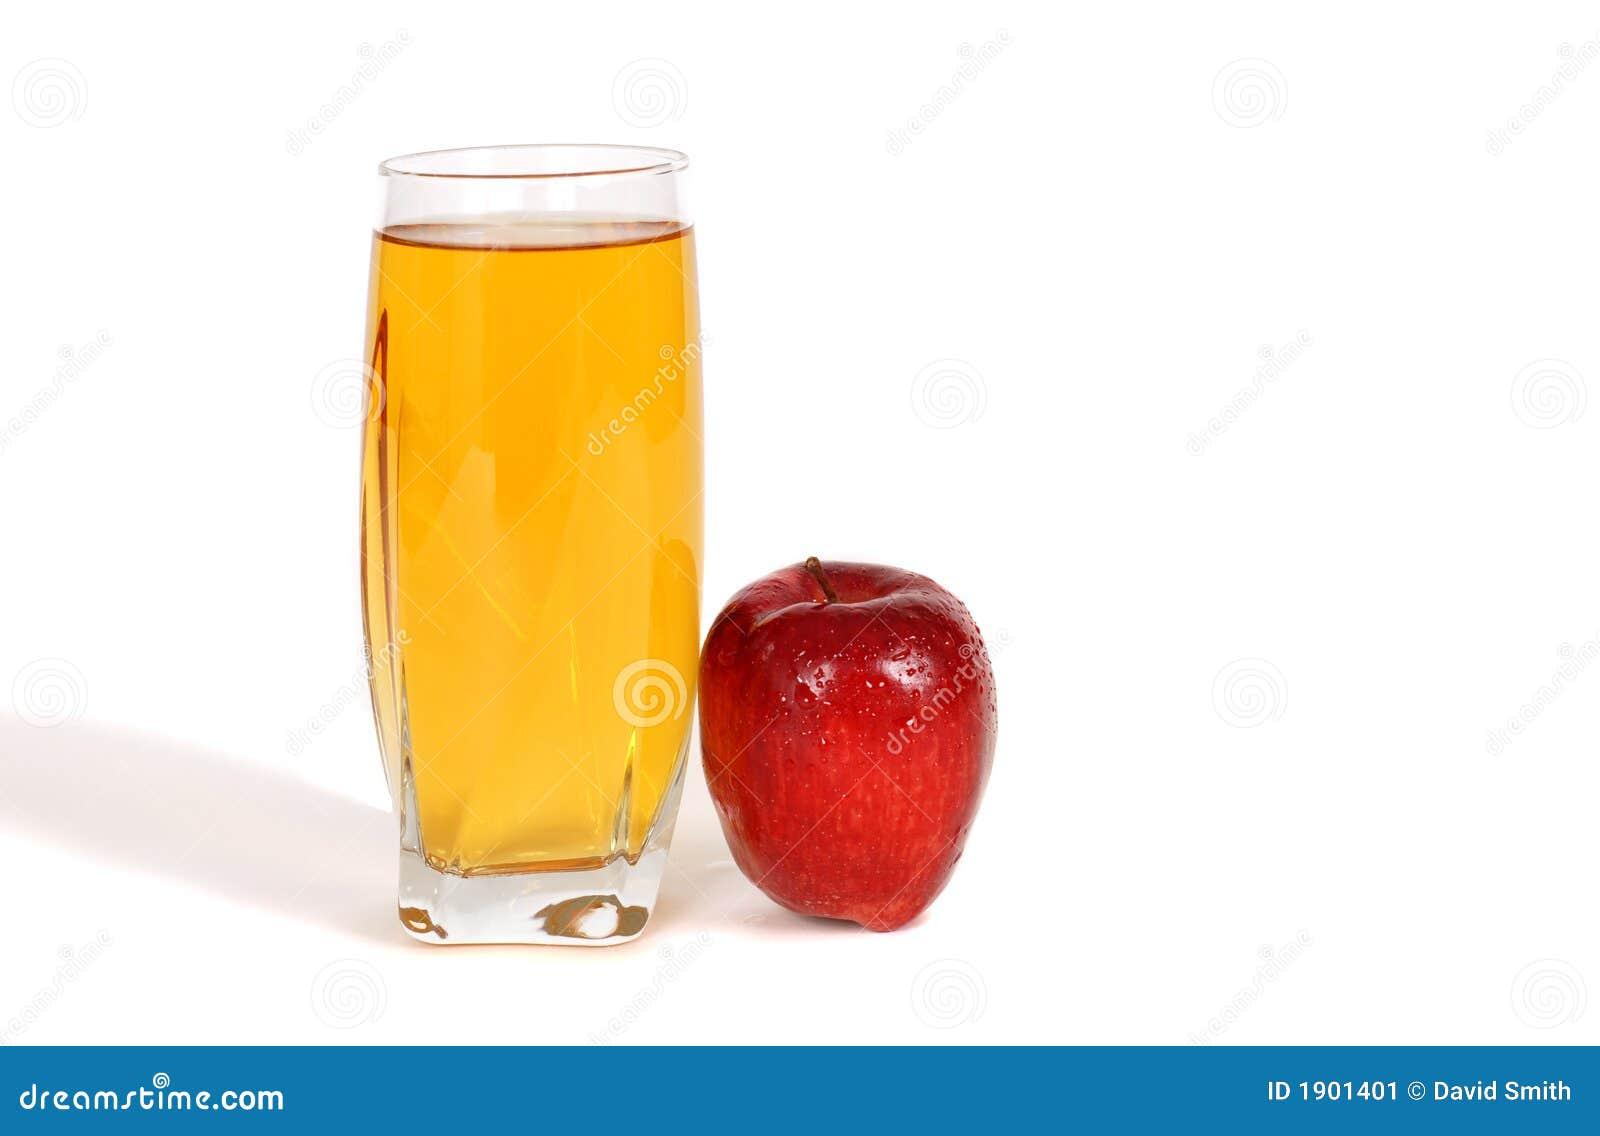 Glass Of Apple Juice Stock Image - Image: 1901401